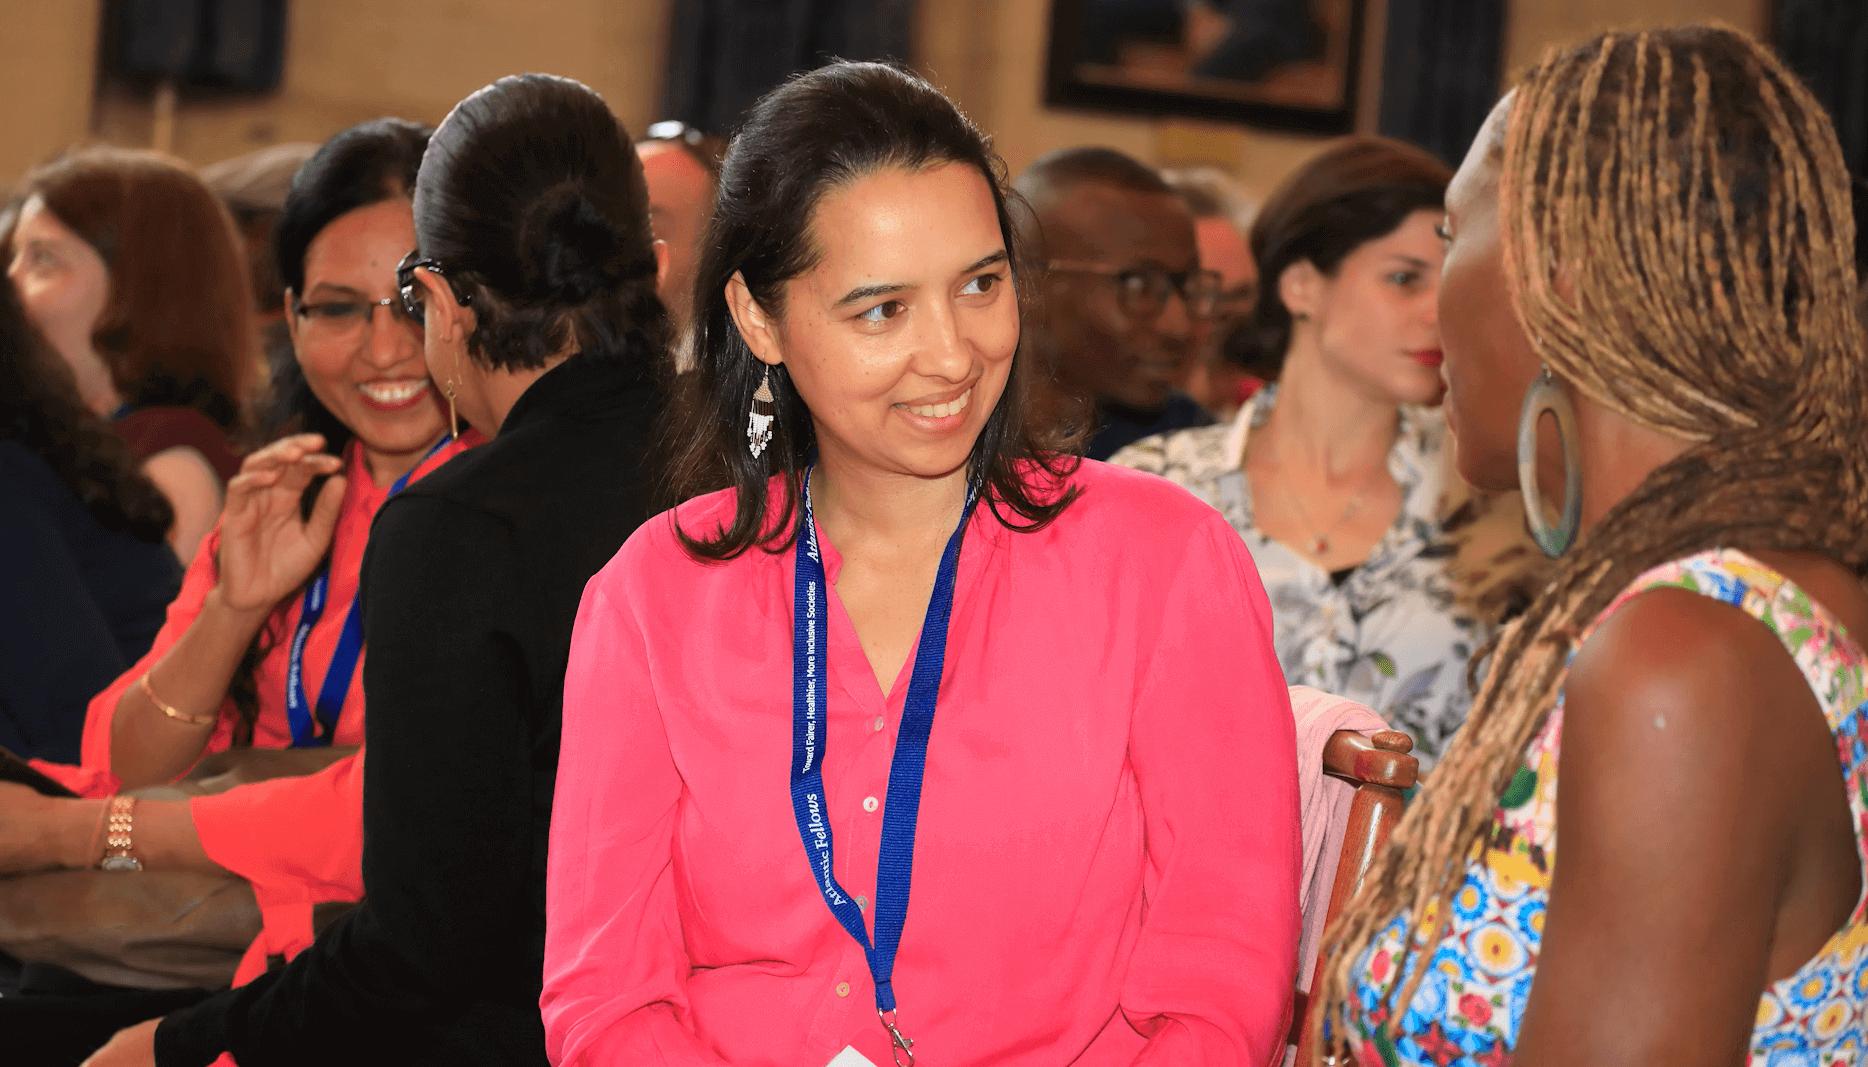 Global Convening of Atlantic Fellows, 2019